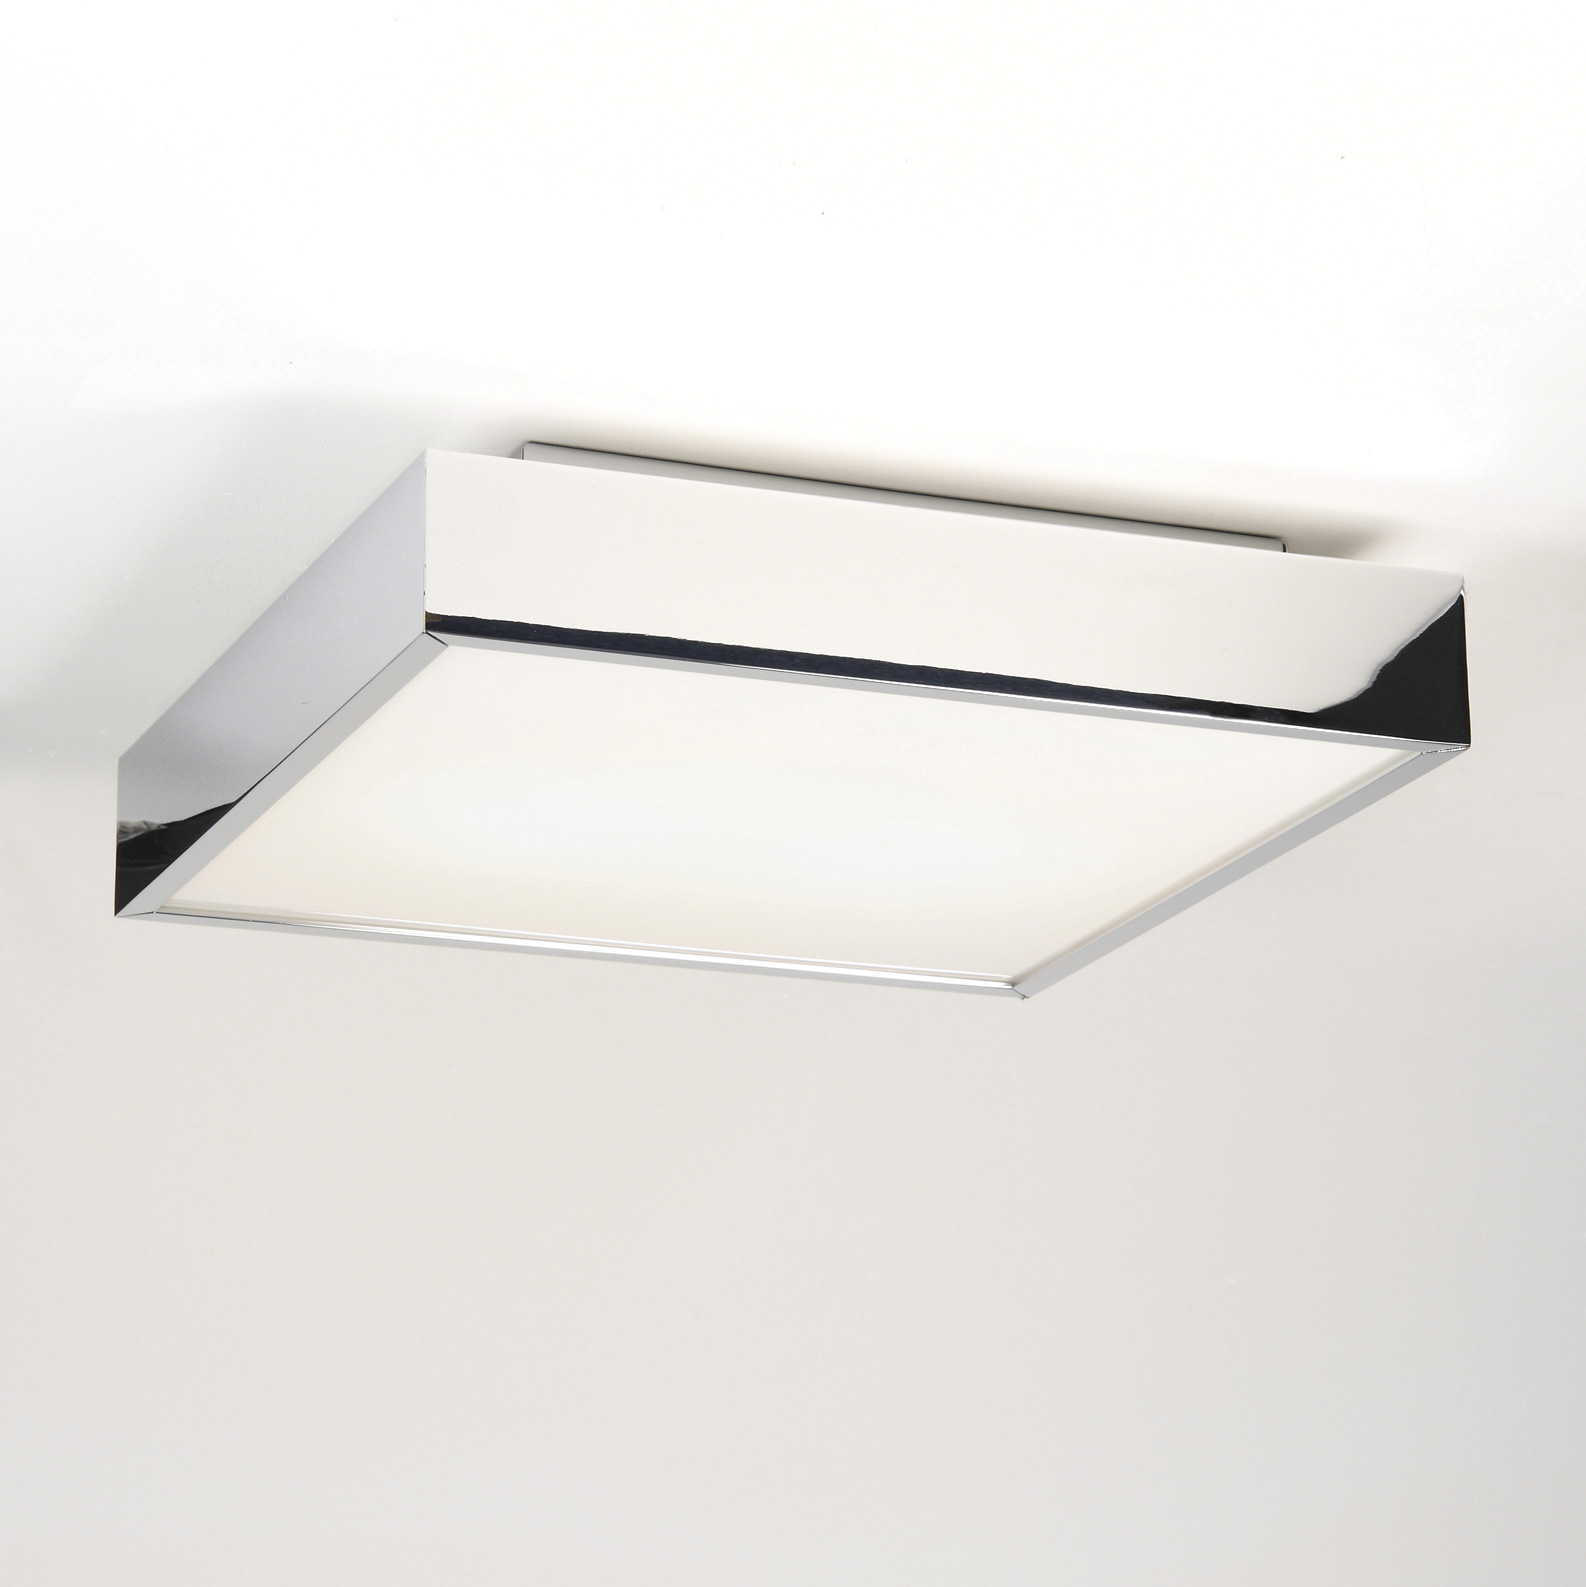 led lights bathroom ceiling photo - 3